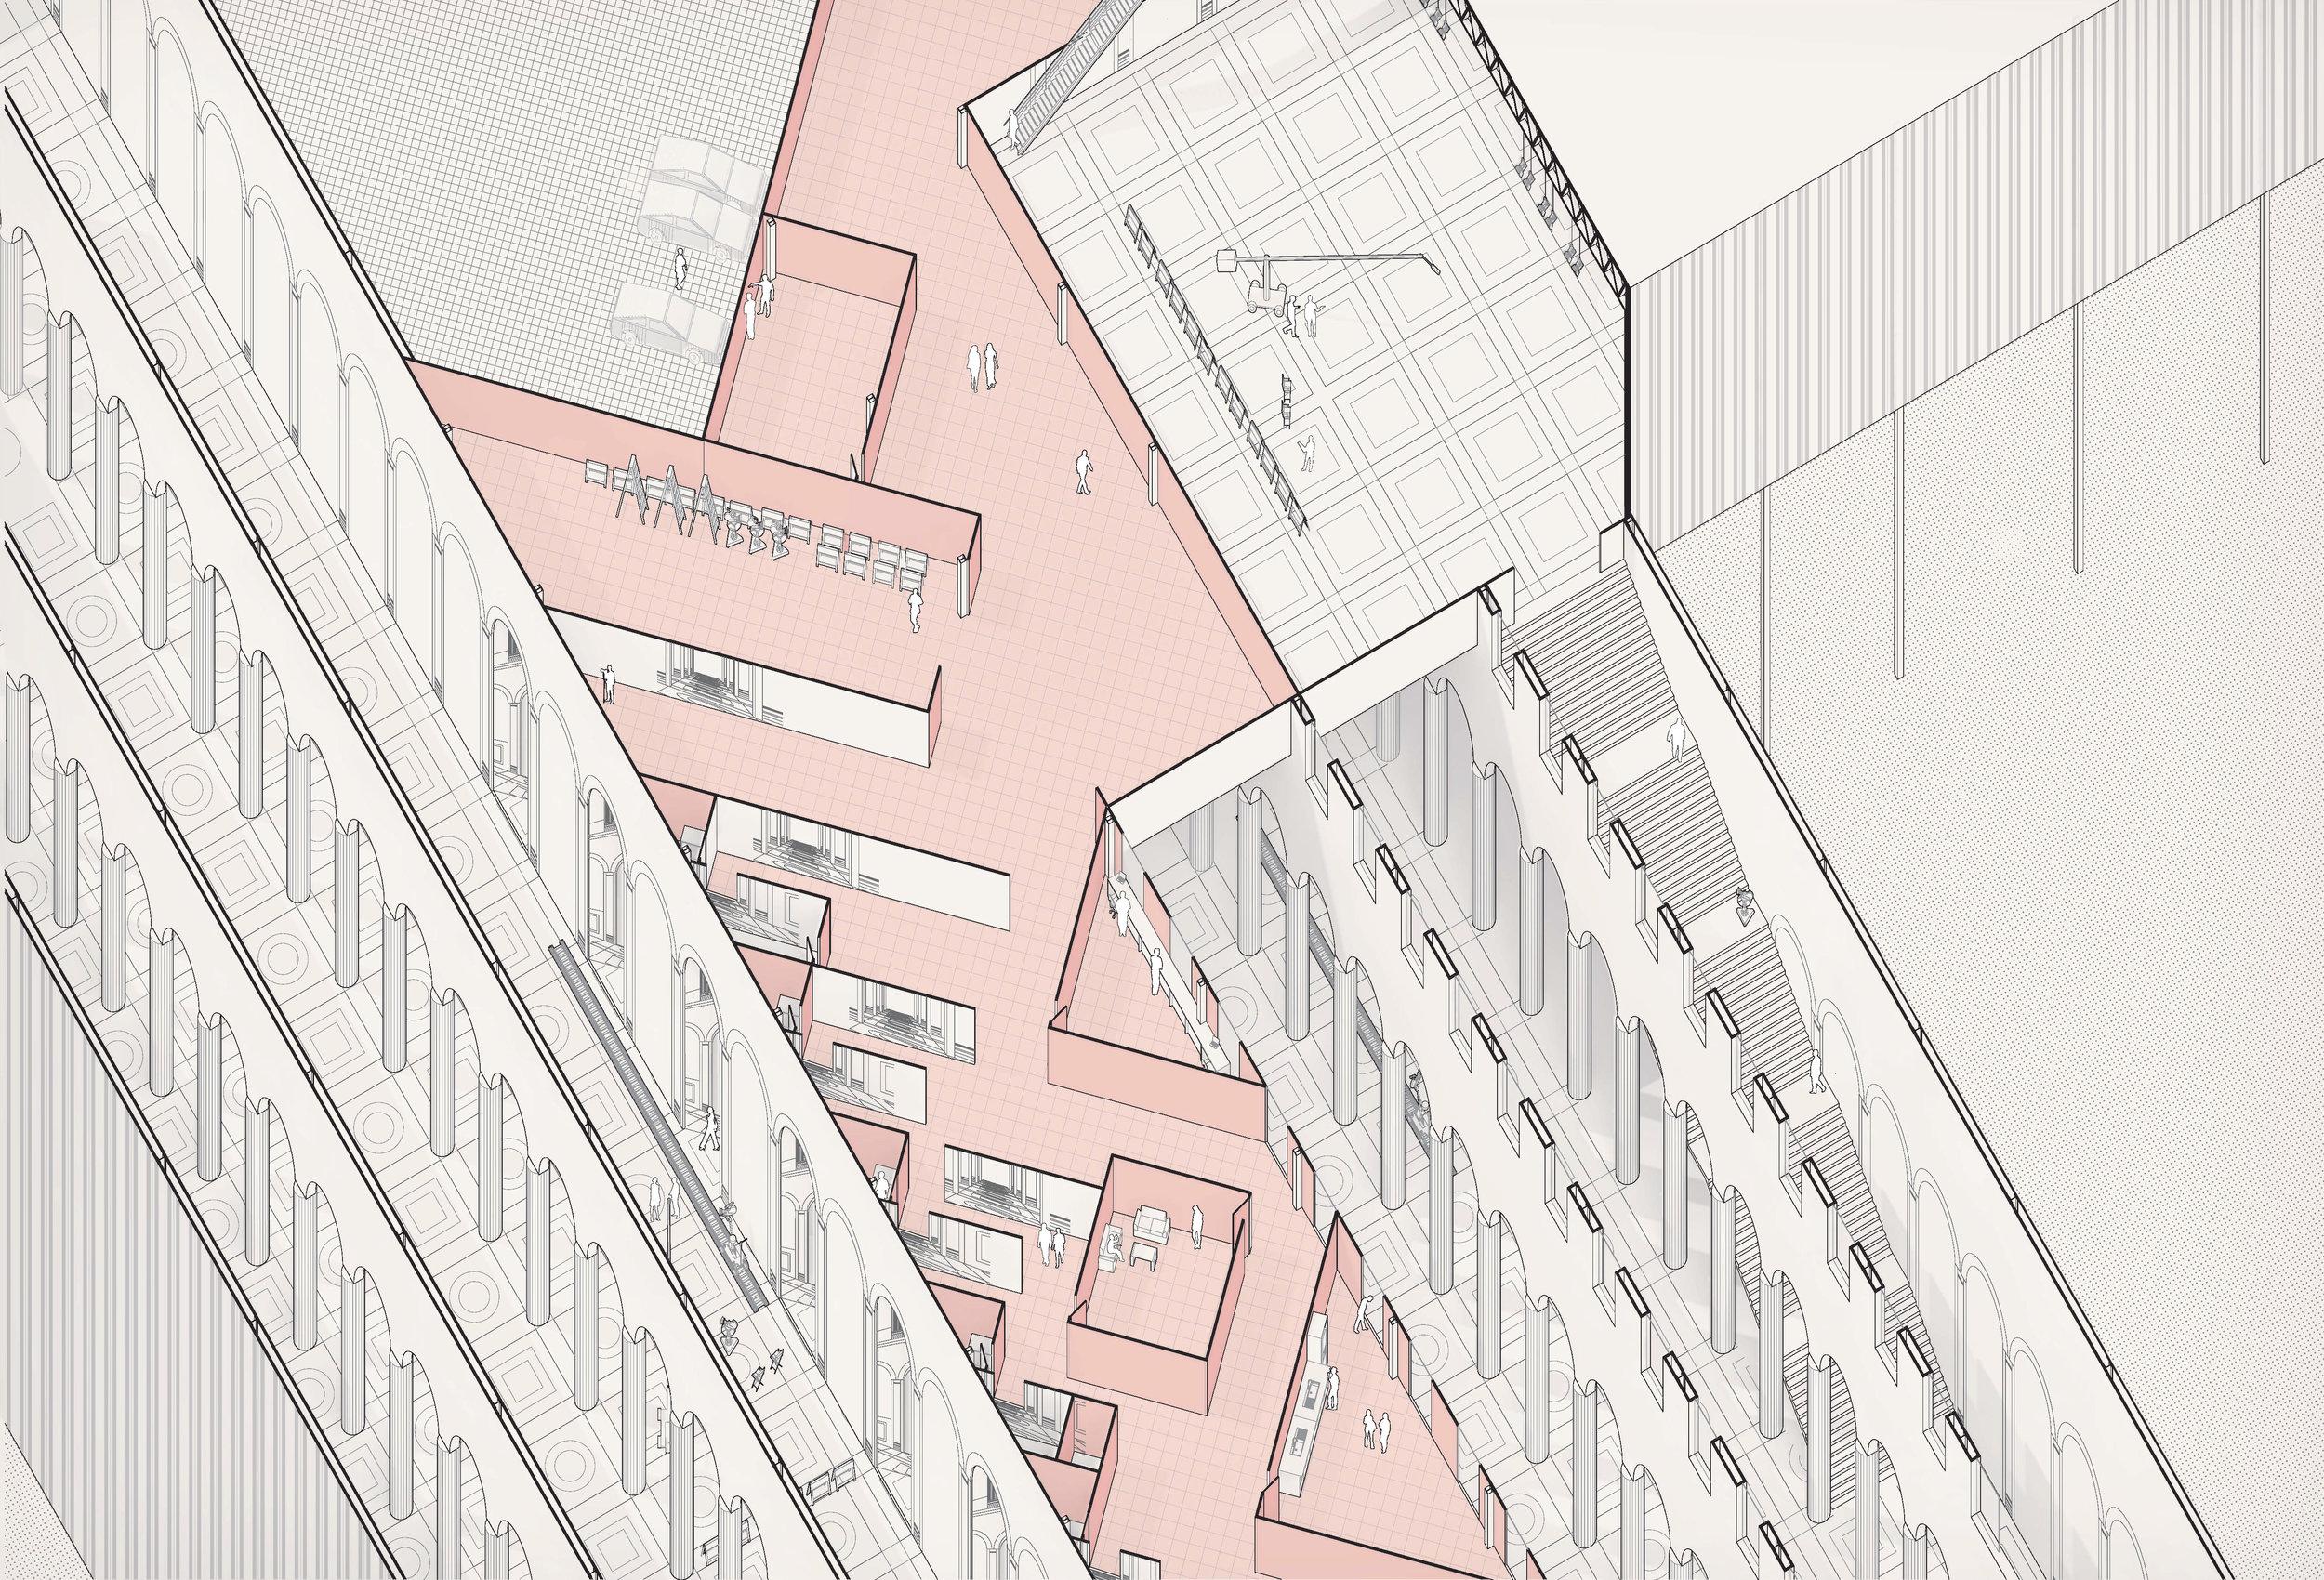 Plan Oblique Interior View